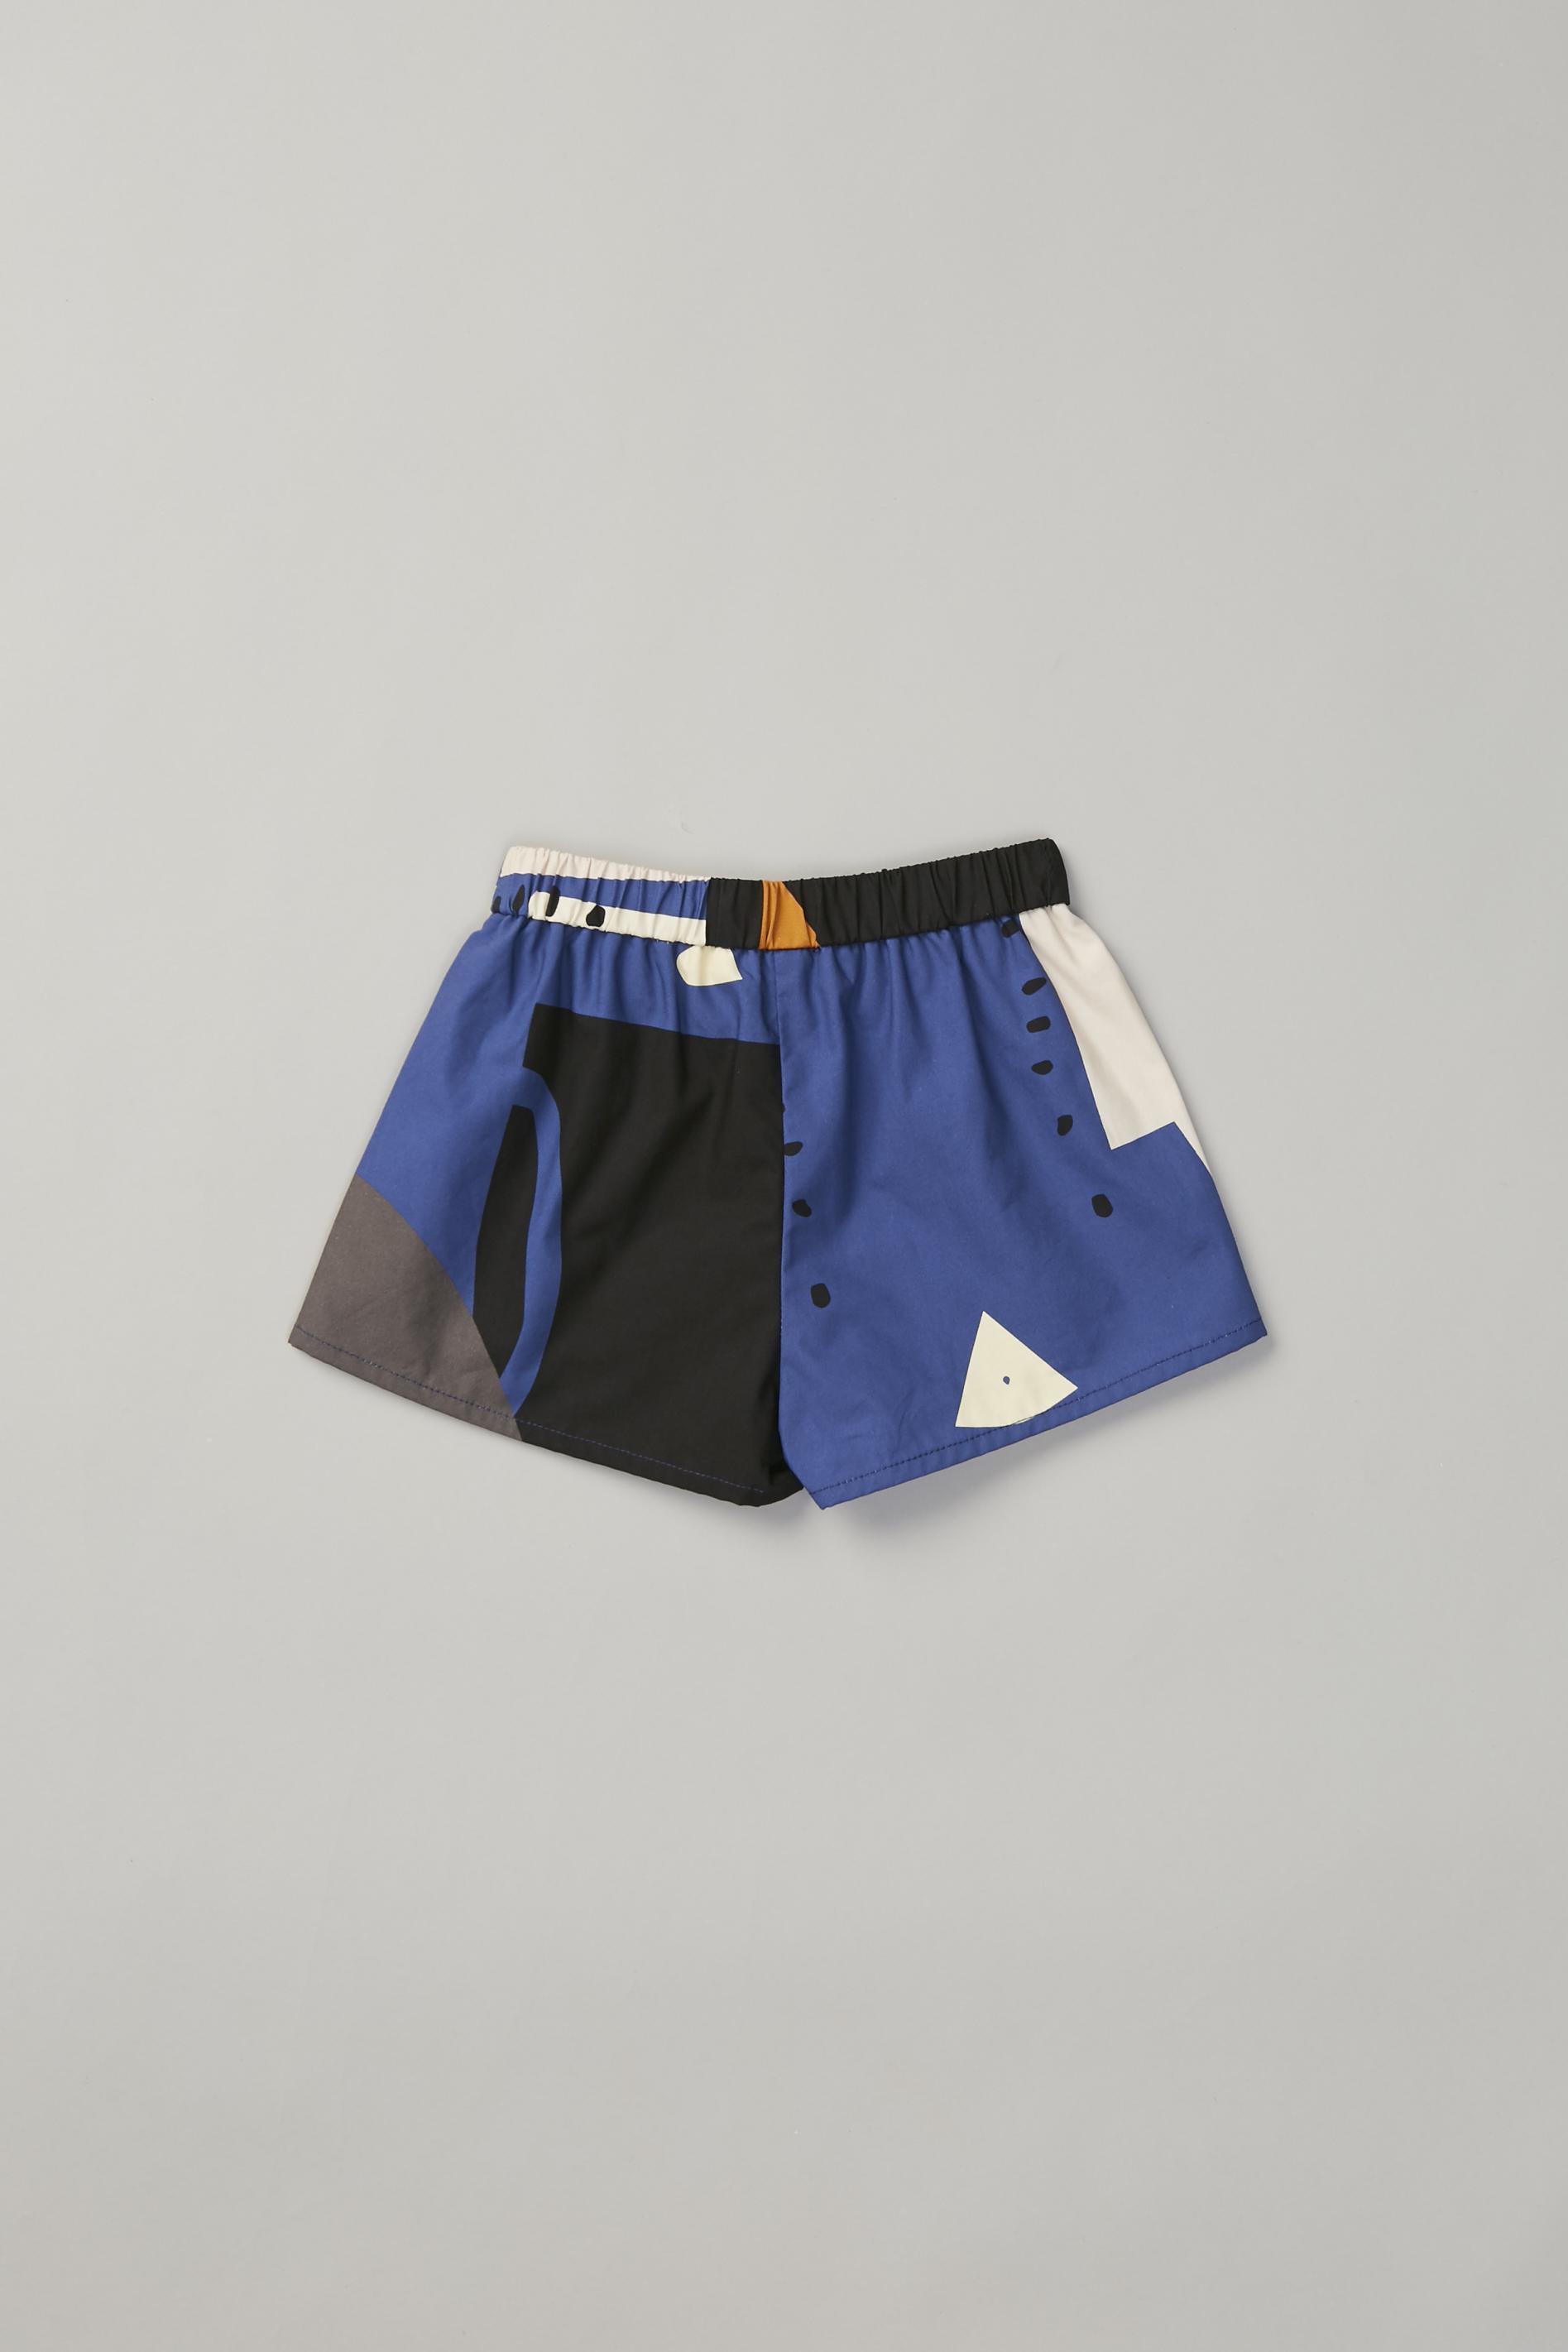 Roadmap Shorts